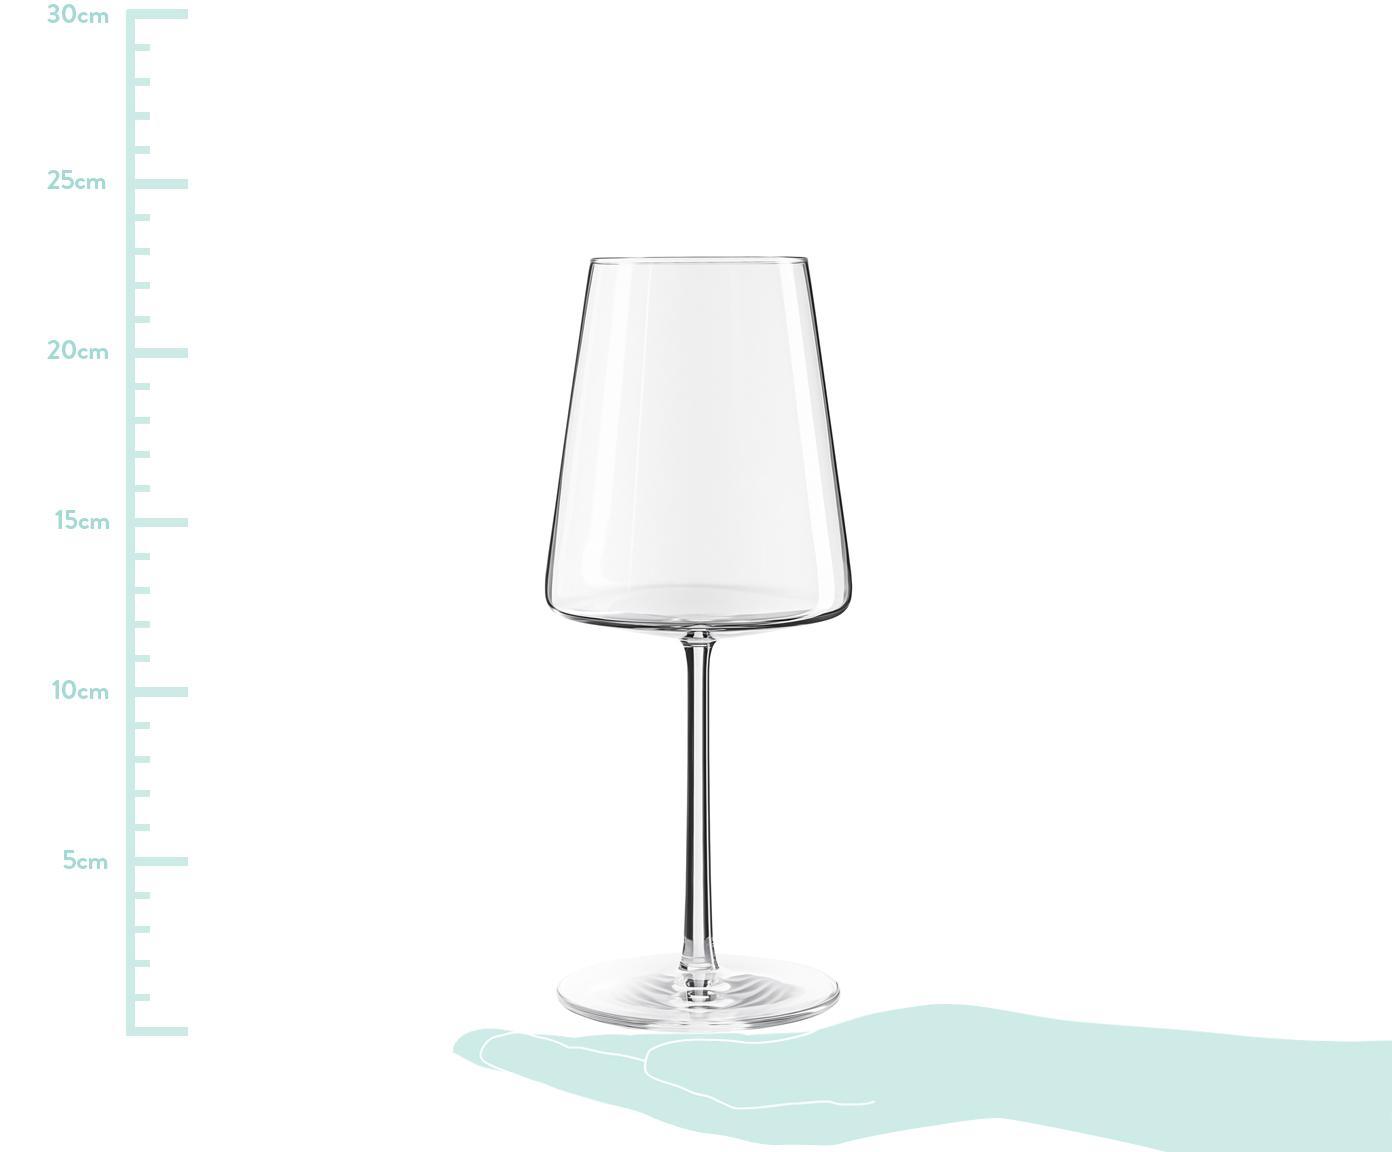 Kristall-Rotweingläser Power in Kegelform, 6er-Set, Kristallglas, Transparent, Ø 9 x H 23 cm